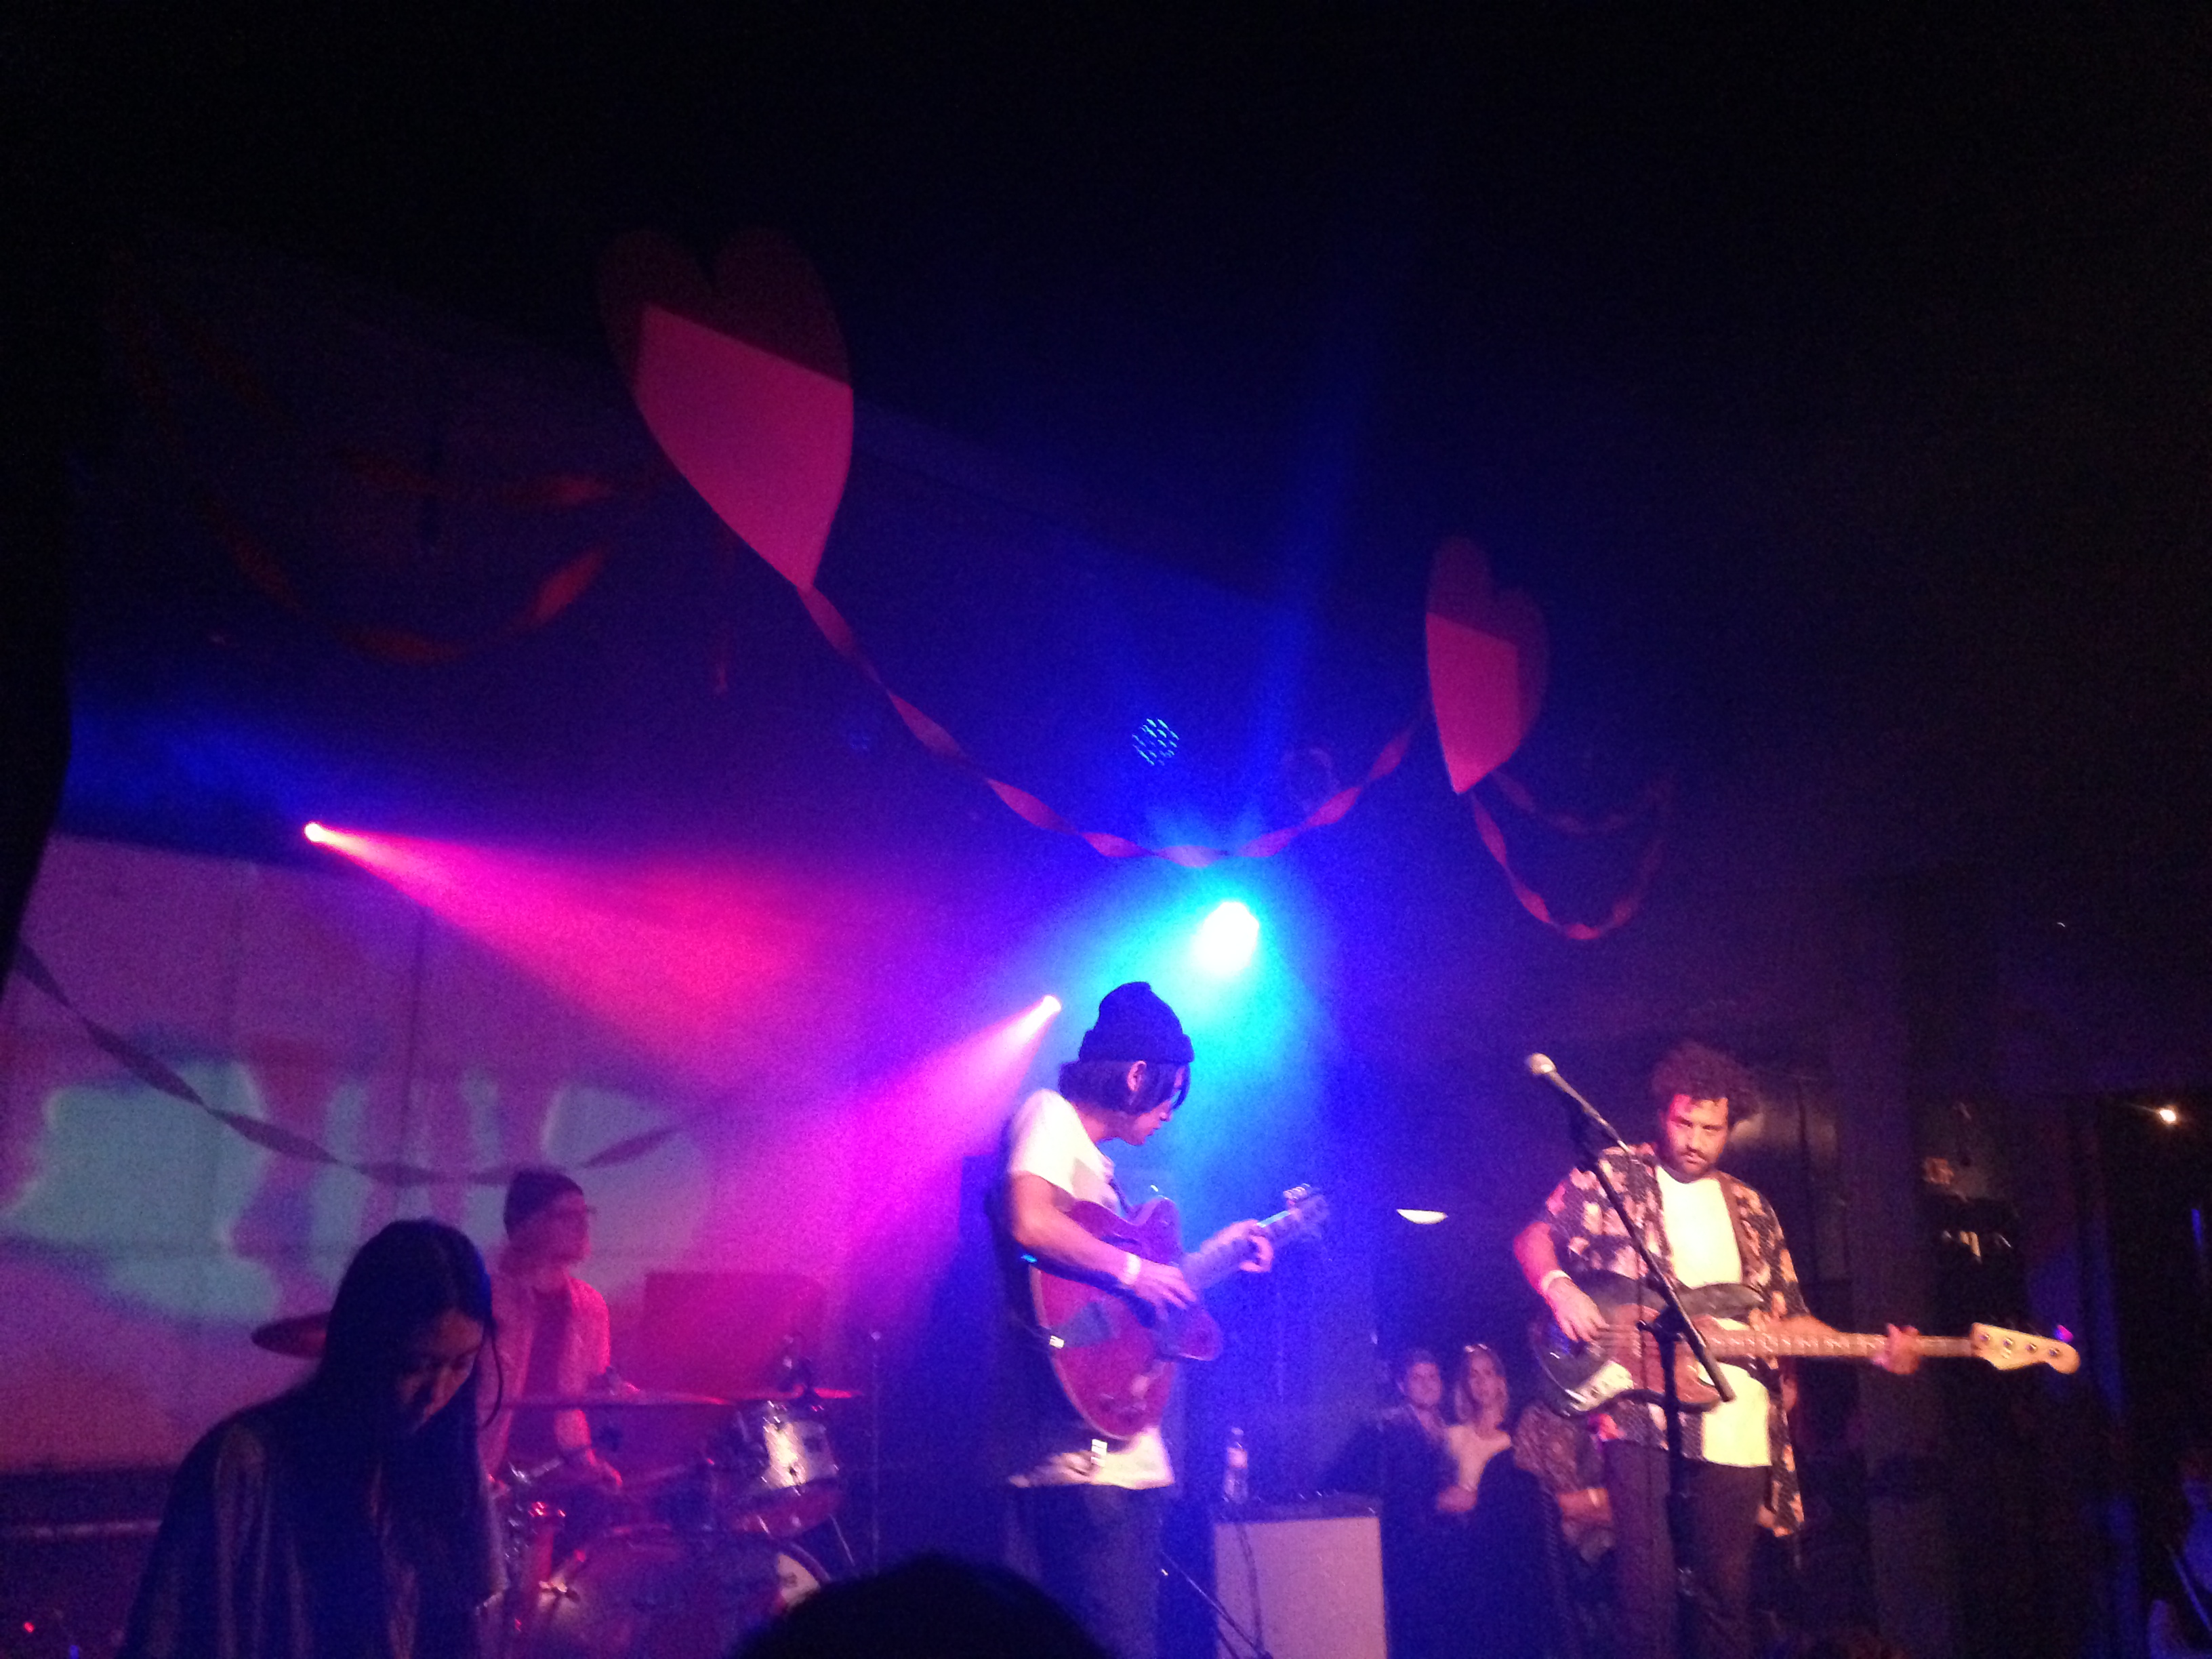 LIVE REVIEW: Lolipalooza @ The Echoplex (Echo Park, CA)